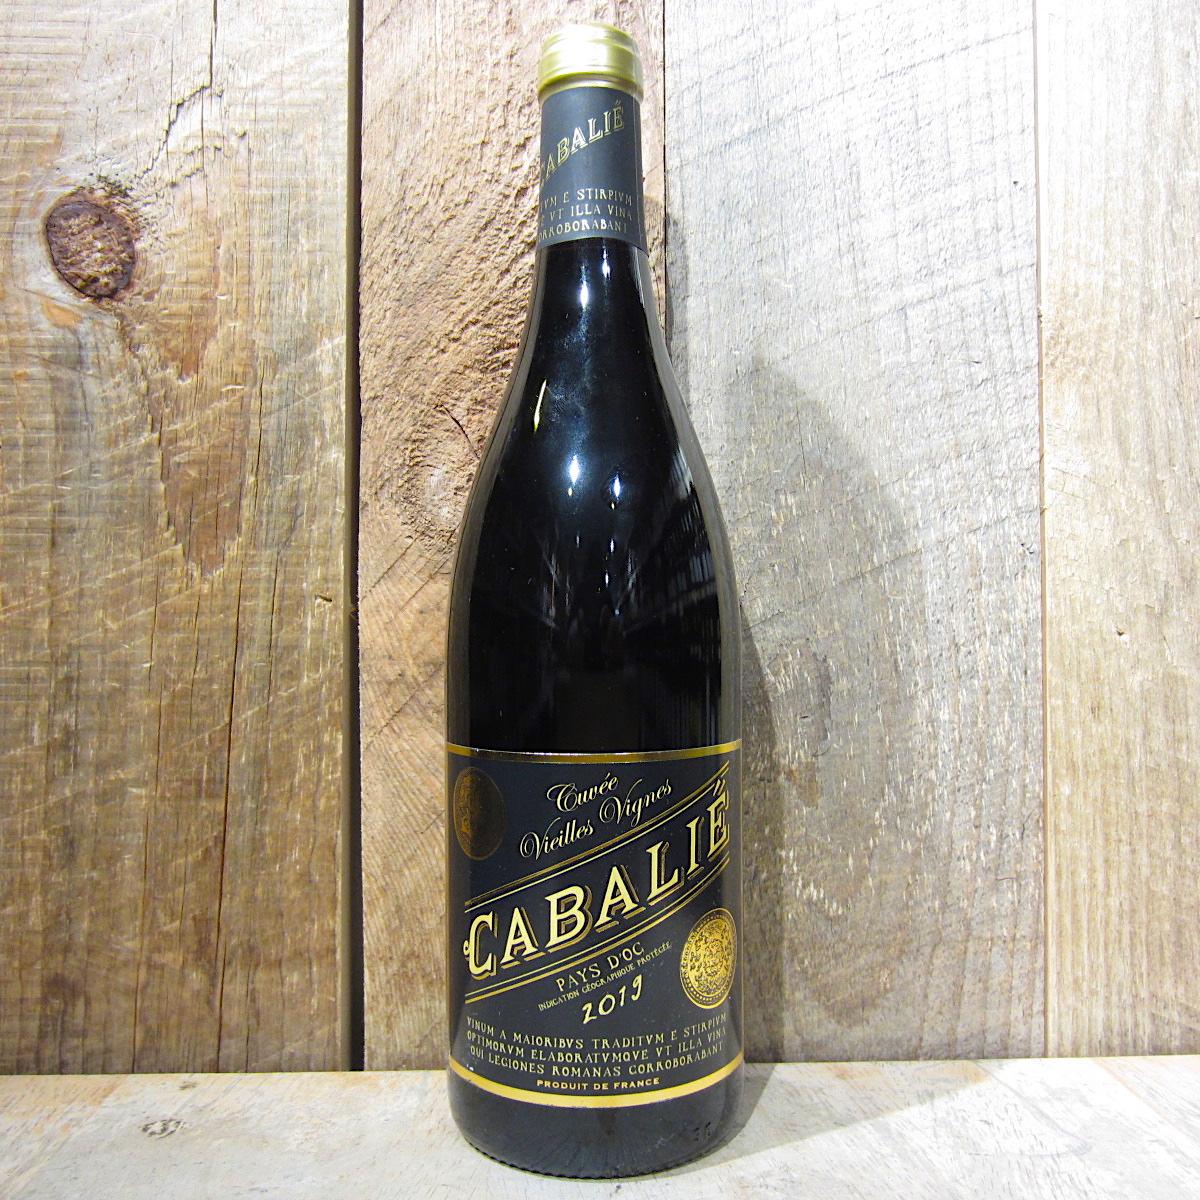 Cabalie Cuvee Vieilles Vignes 2018/19 750ml